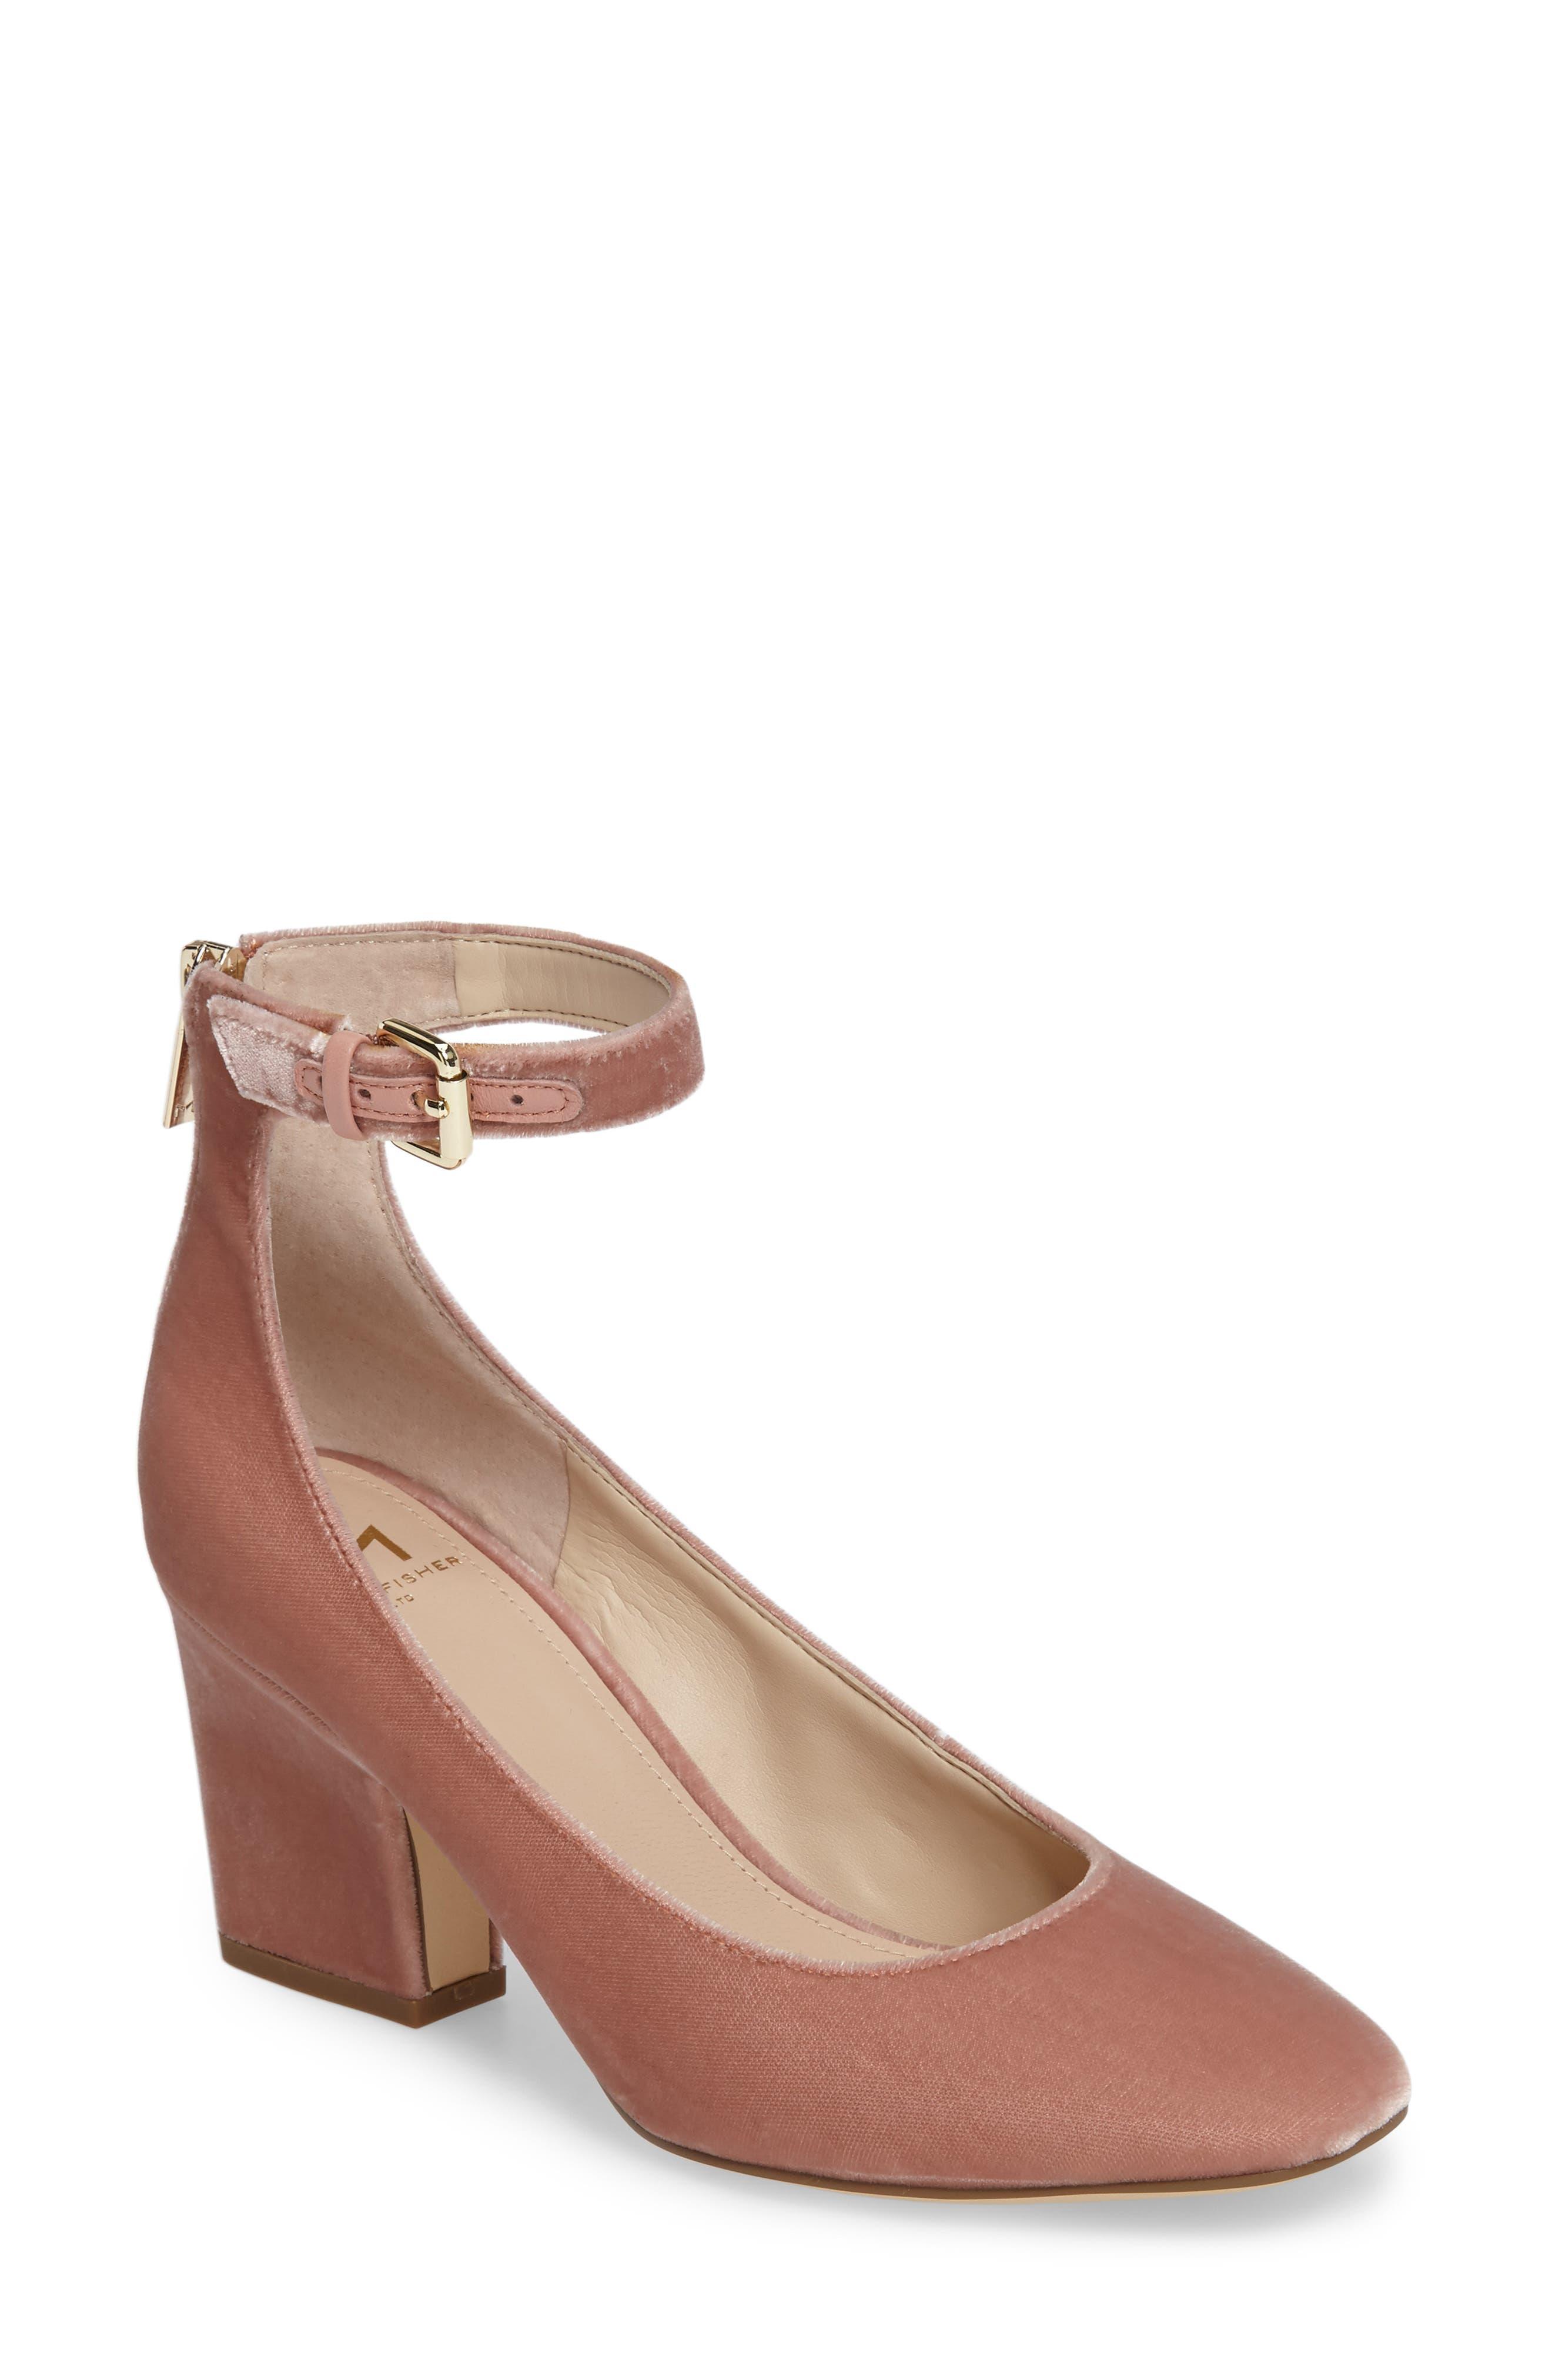 Anisy Ankle Strap Pump,                         Main,                         color, Blush Velvet